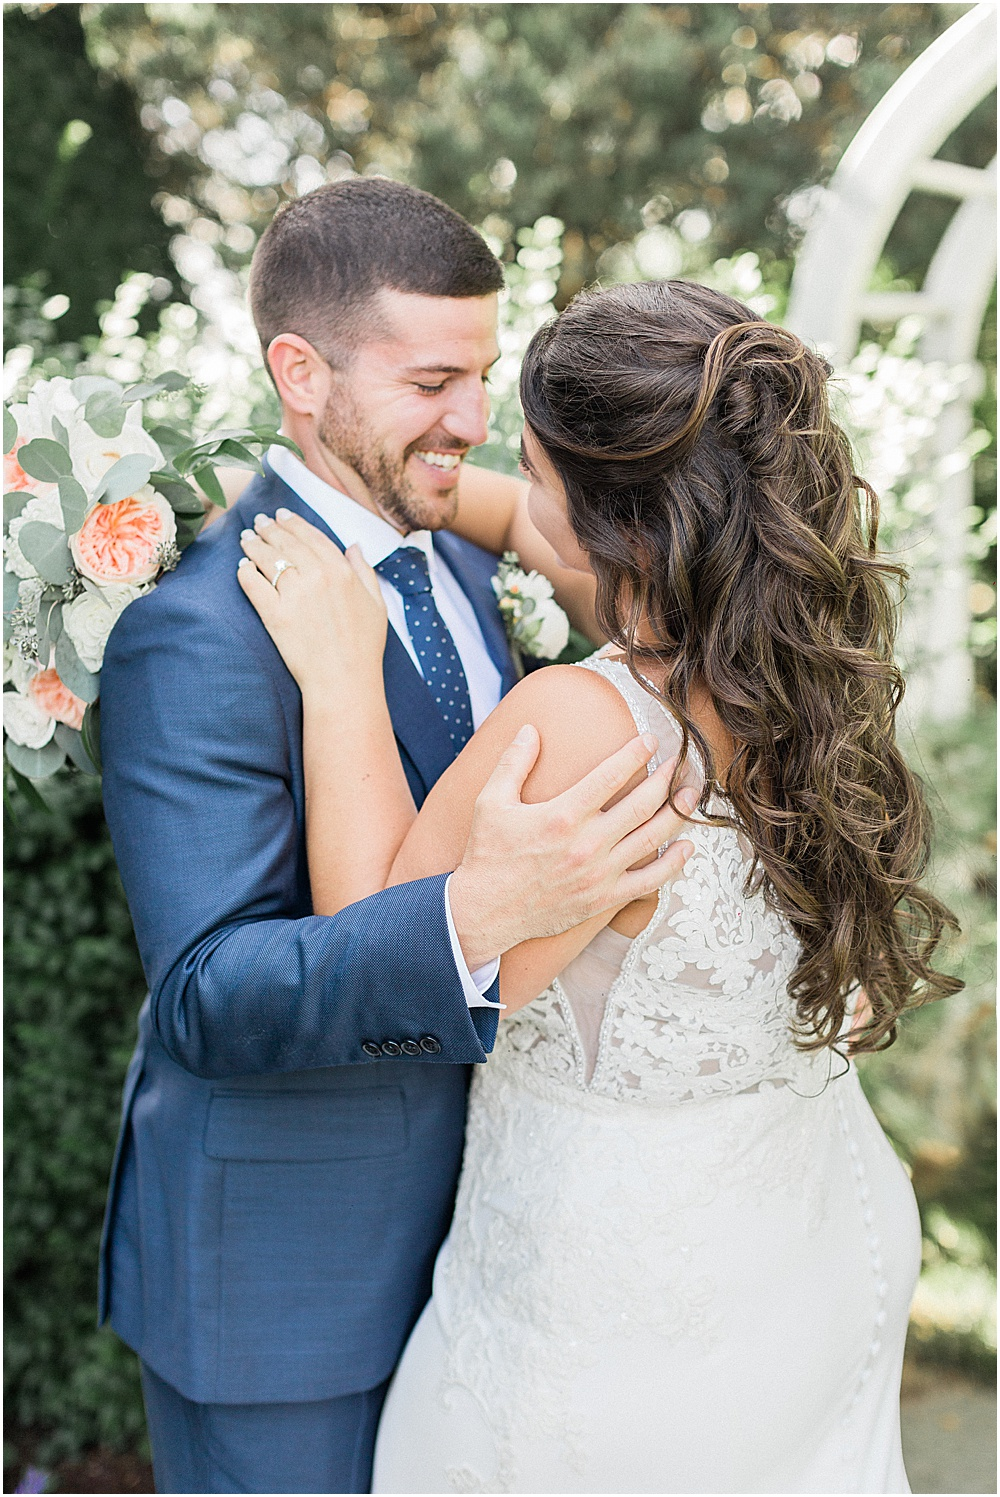 tabor_academy_rebecca_chris_tented_interior_trees_engagement_session_cape_cod_massachusetts_boston_wedding_photographer_meredith_jane_photography_photo_0702.jpg